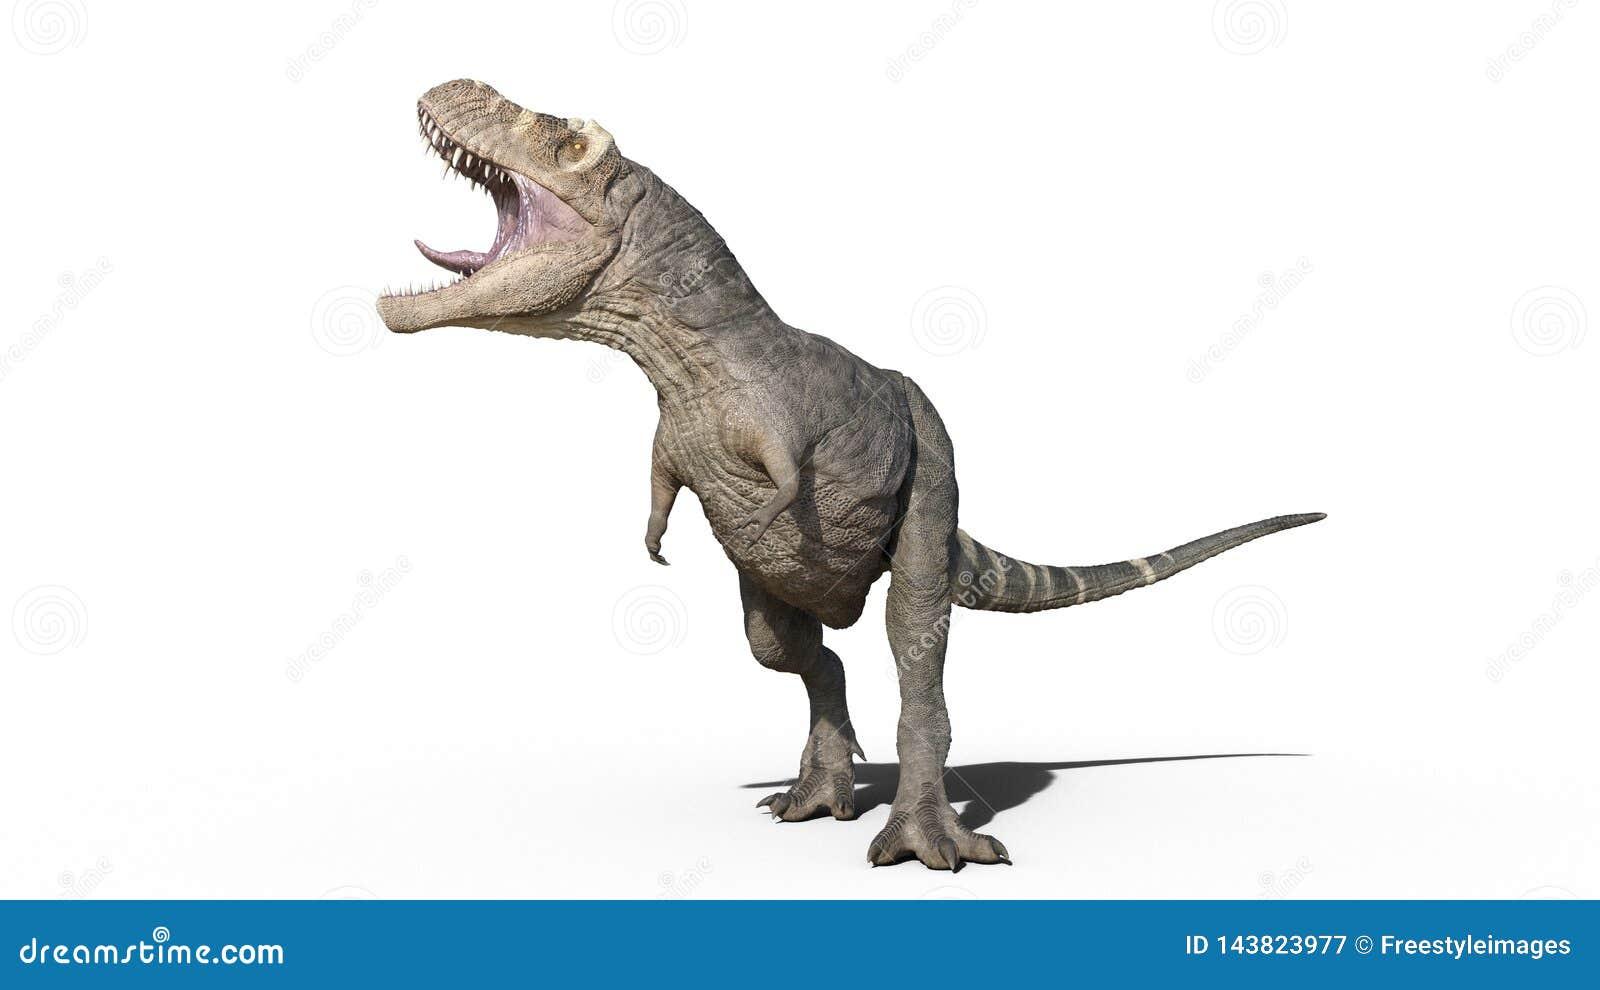 T雷克斯恐龙,暴龙雷克斯爬行动物吼声,在白色背景隔绝的史前侏罗纪动物,3D翻译